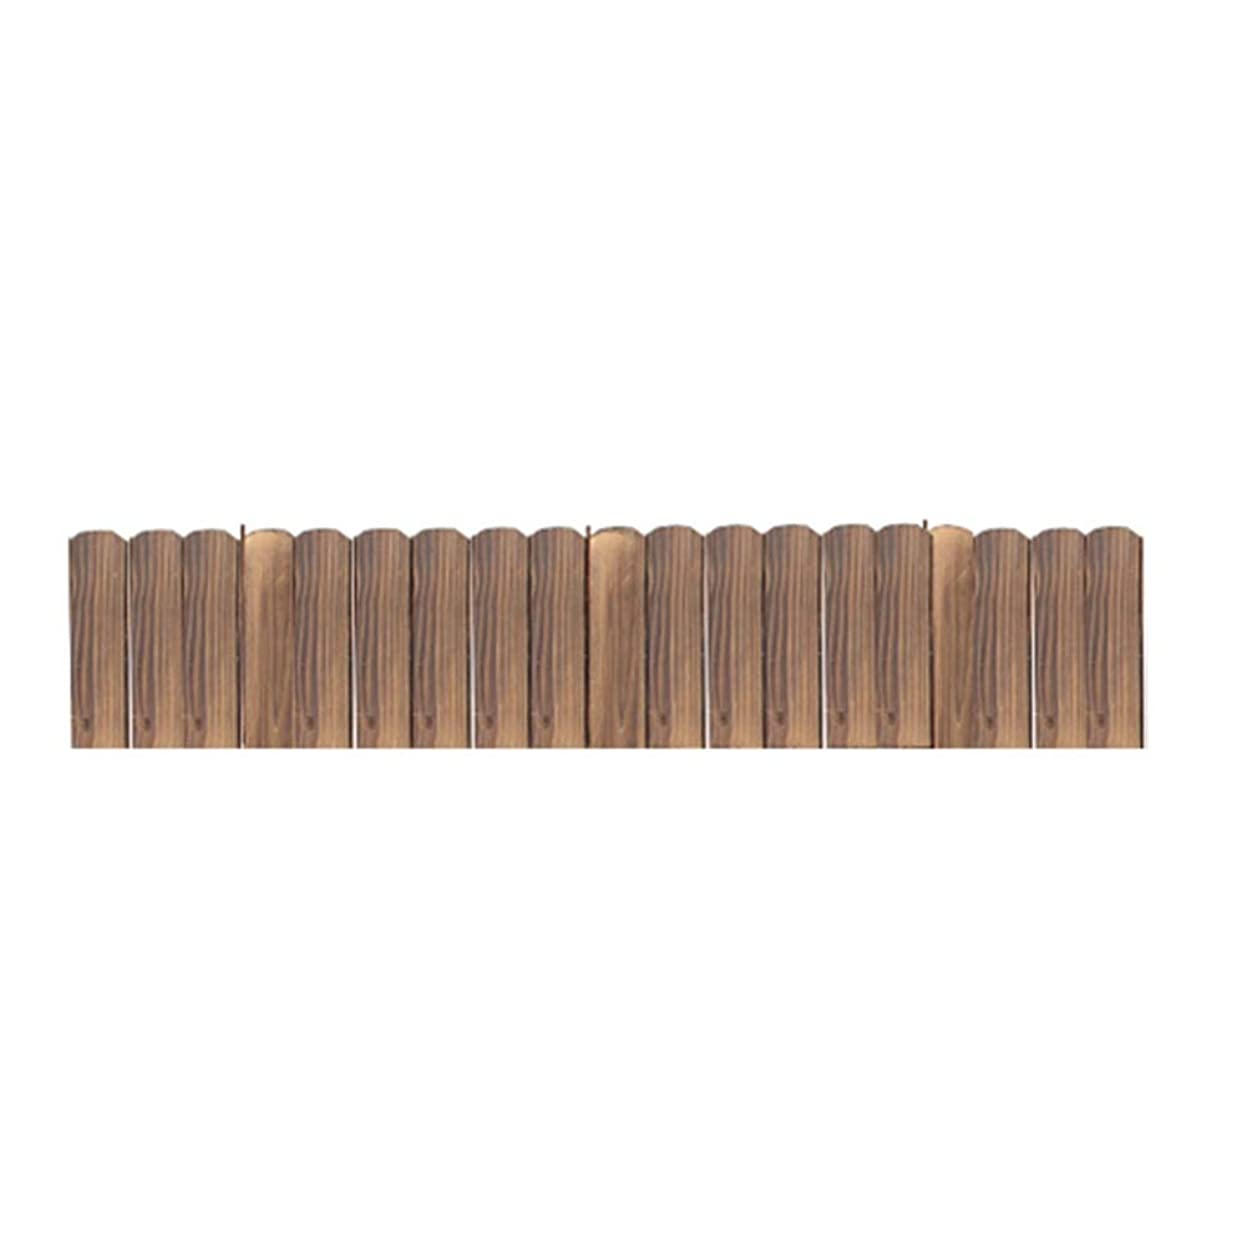 GZHENH 木製ボーダーテンプレート 断つ 保護 抗酸化 耐摩耗性 無垢材 アウトドア 手作り 、2つのスタイル 、4サイズ (Color : Brown, Size : 100x20cm)